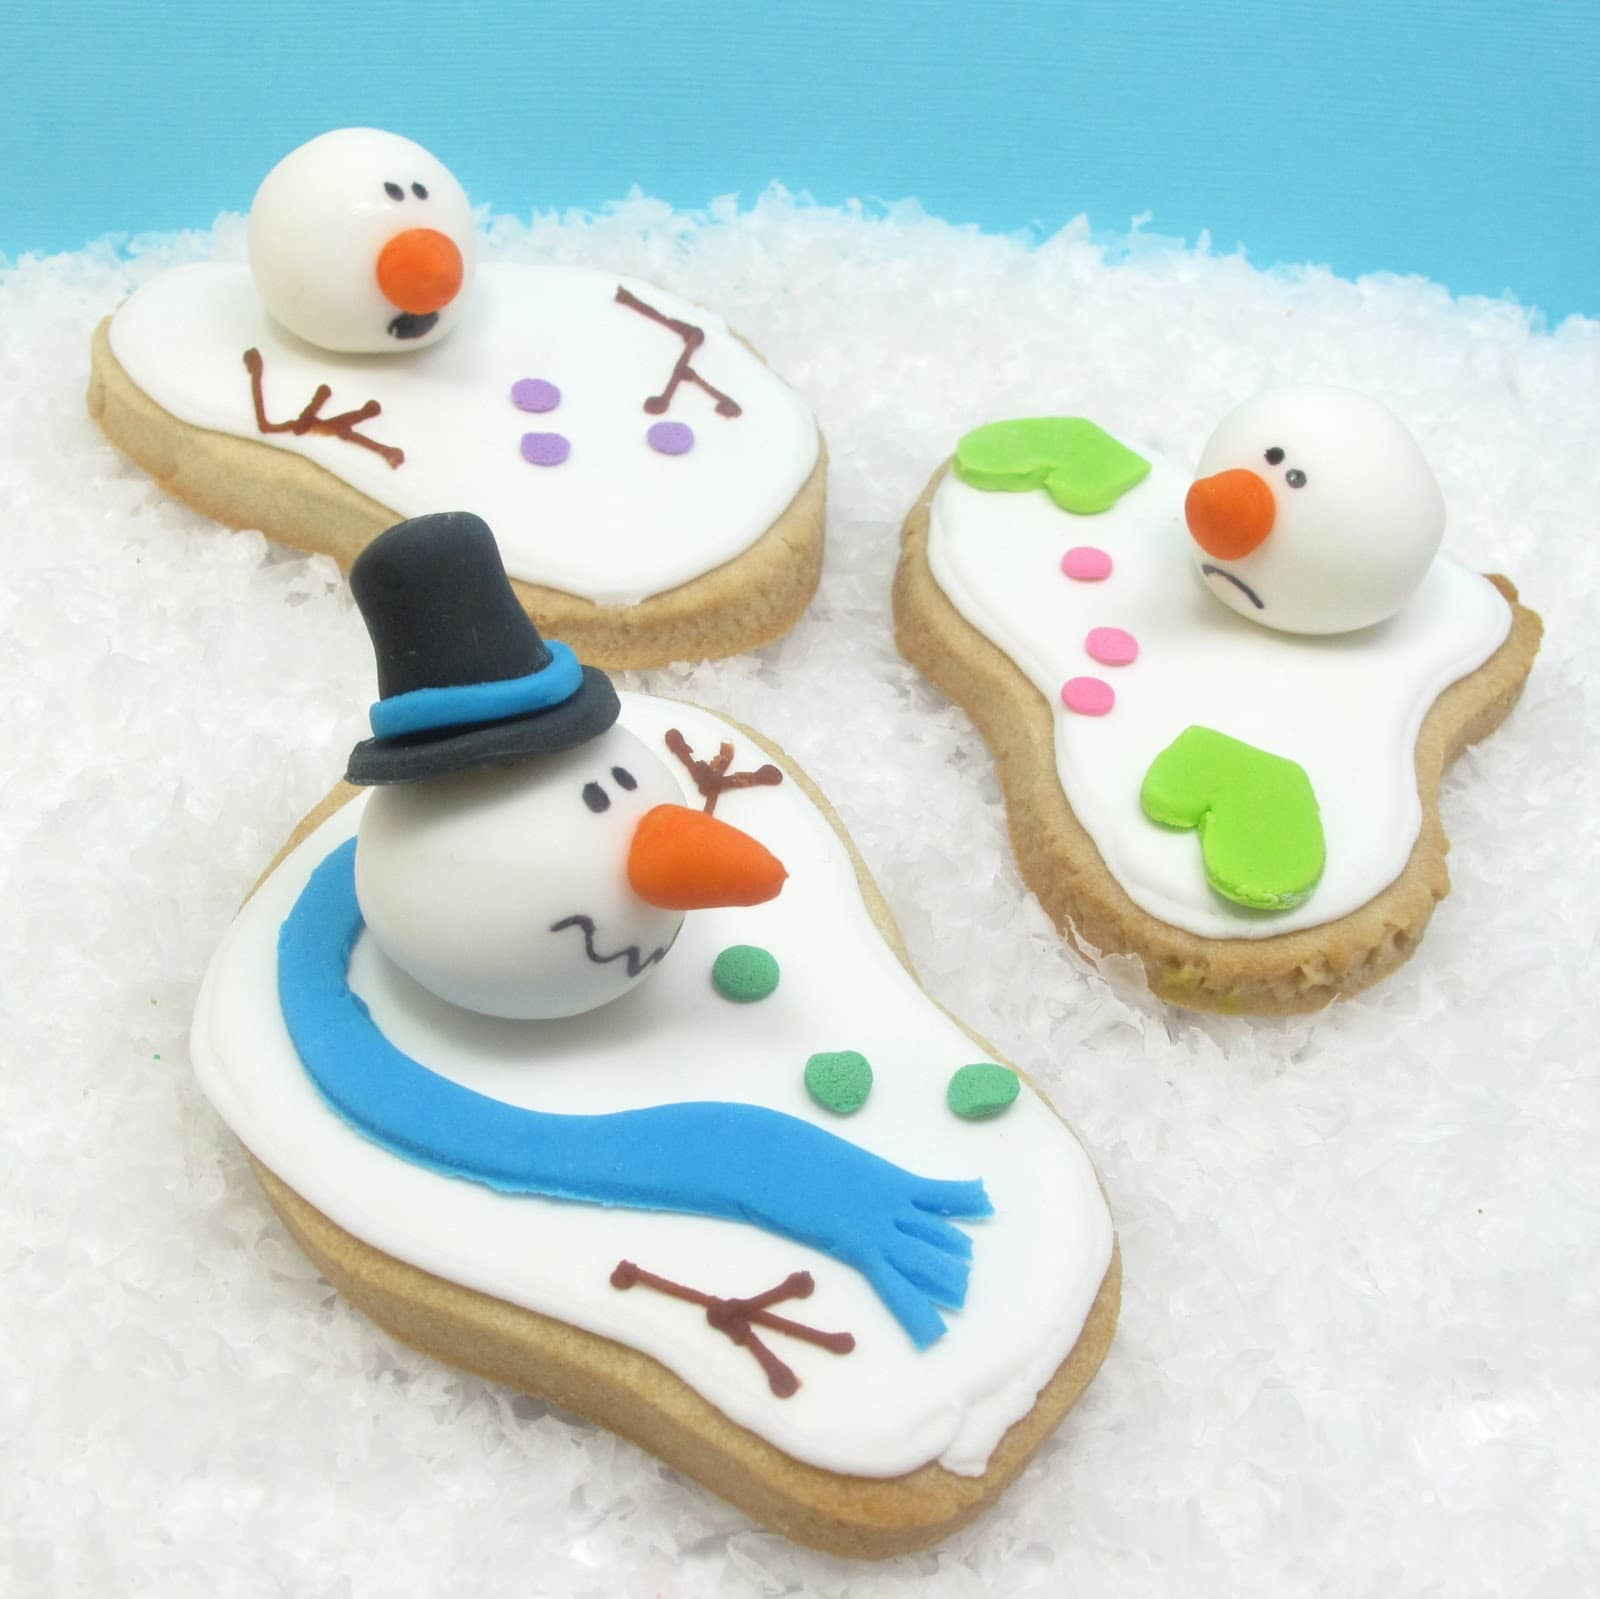 Melting Snowman Christmas Cake